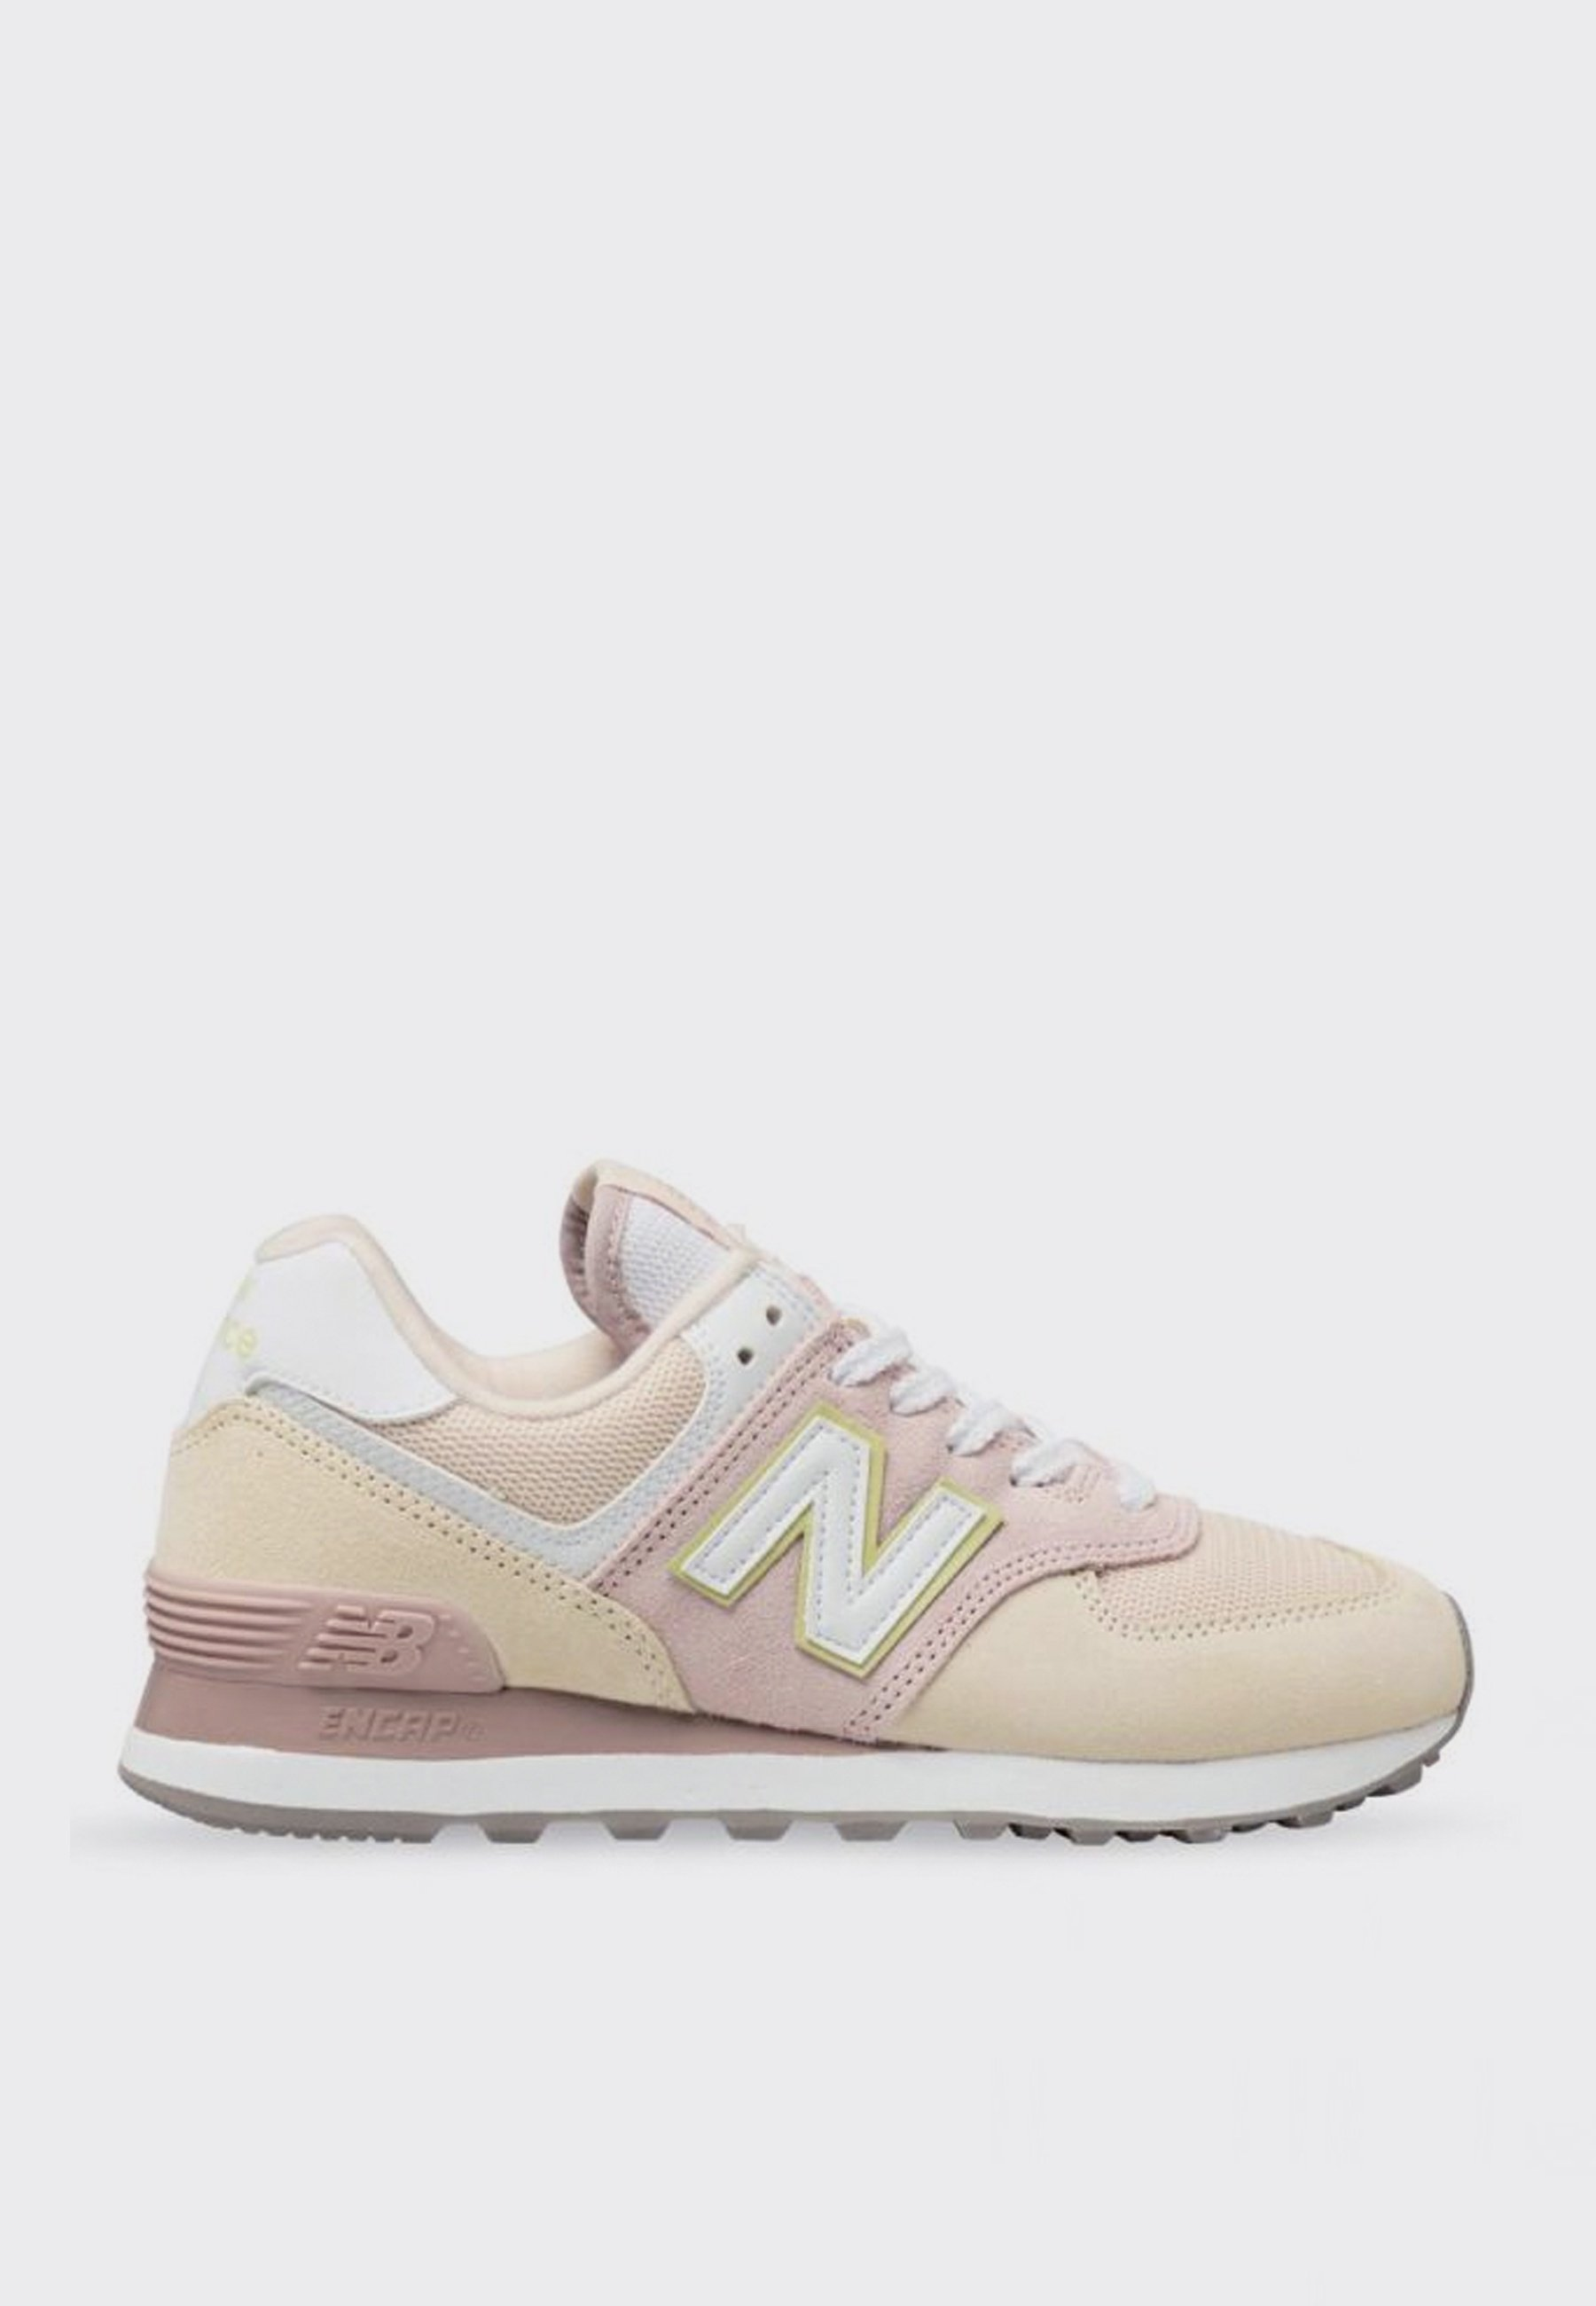 Balance 574 Sneakers - Pink | Garmentory